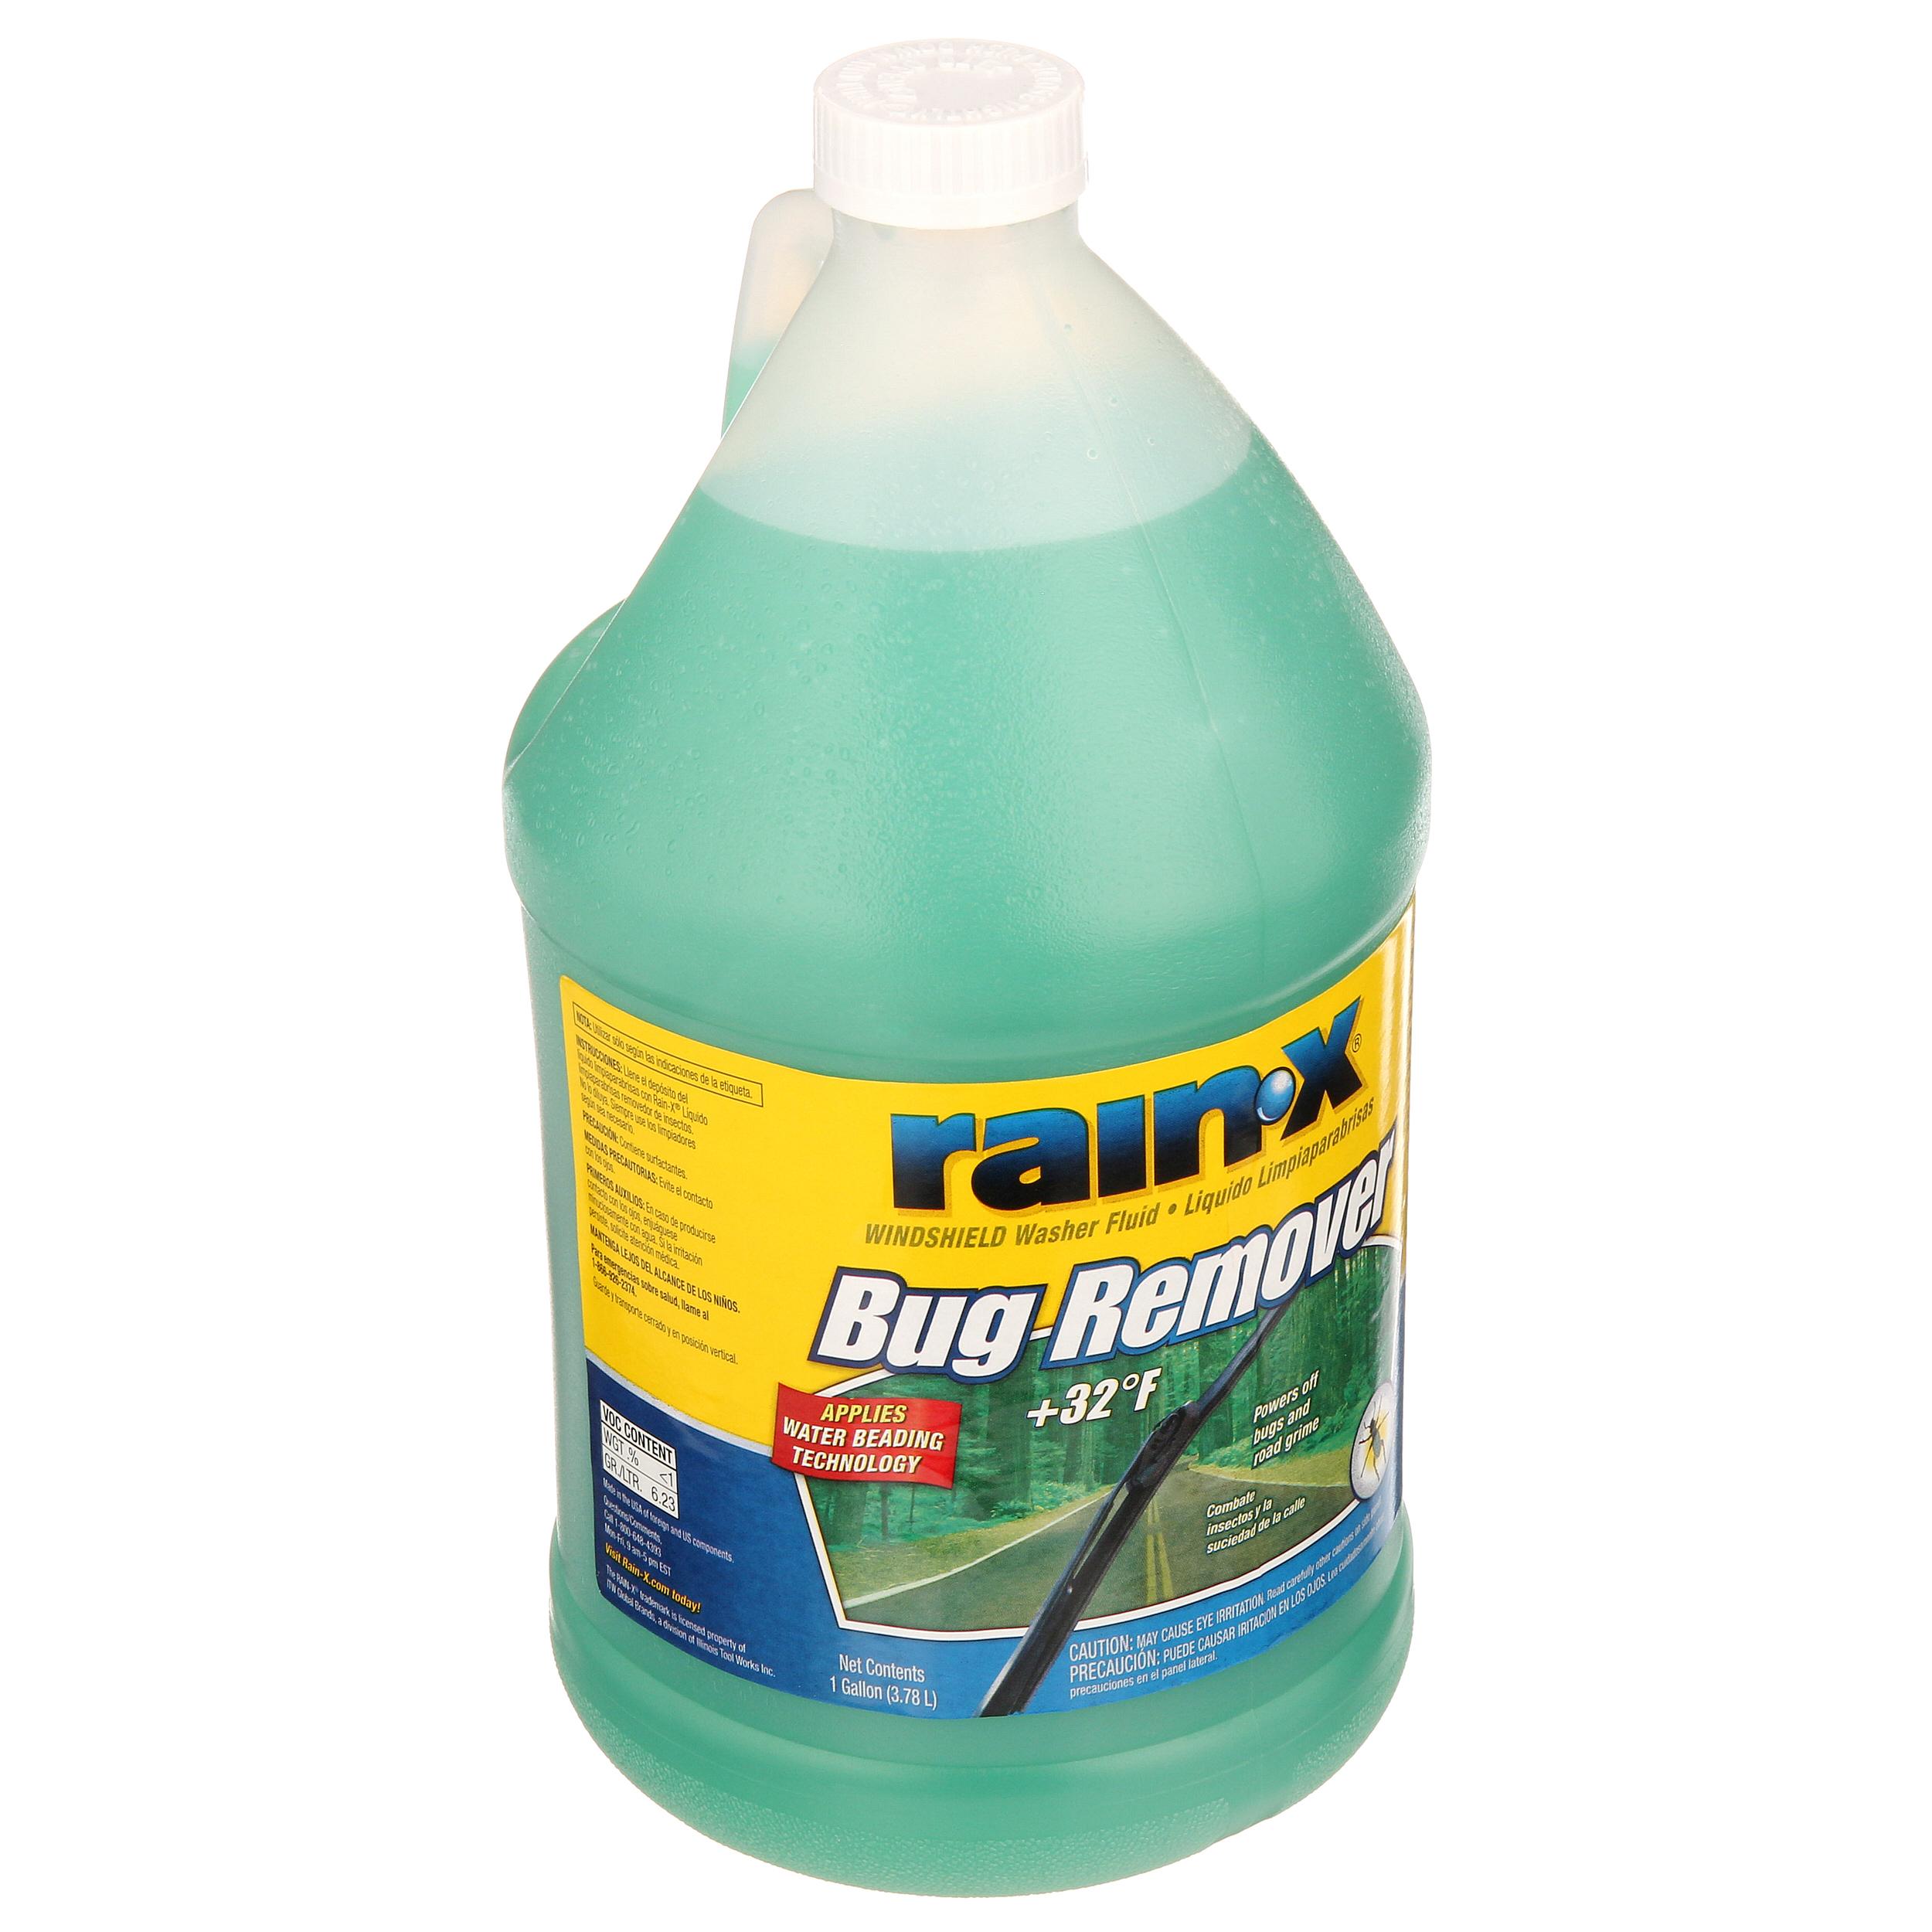 Rain X Bug Remover Windshield Washer Fluid YMMV $0.74